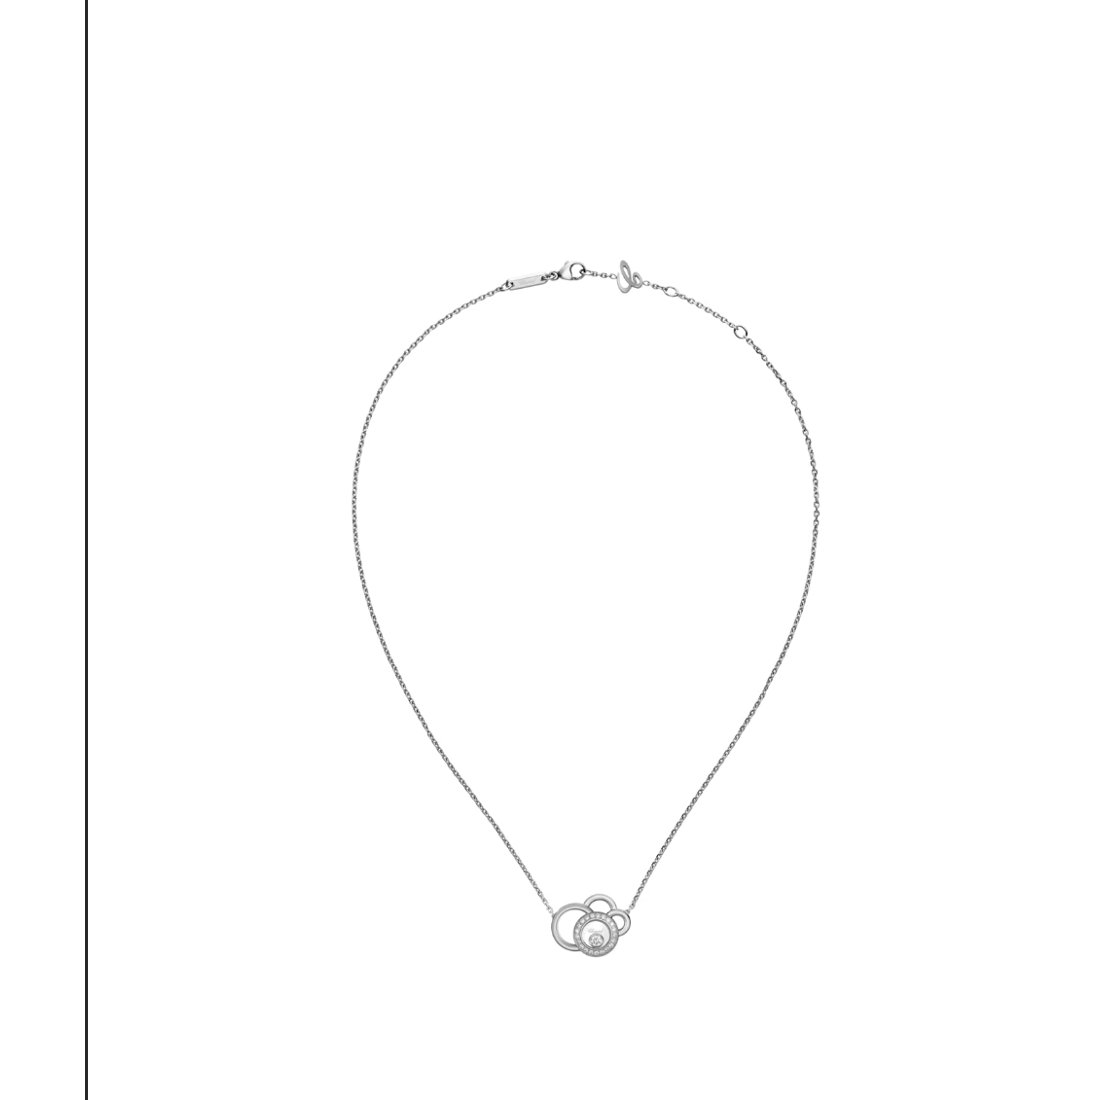 Collier Chopard Happy Dreams en or blanc et diamants vue 4